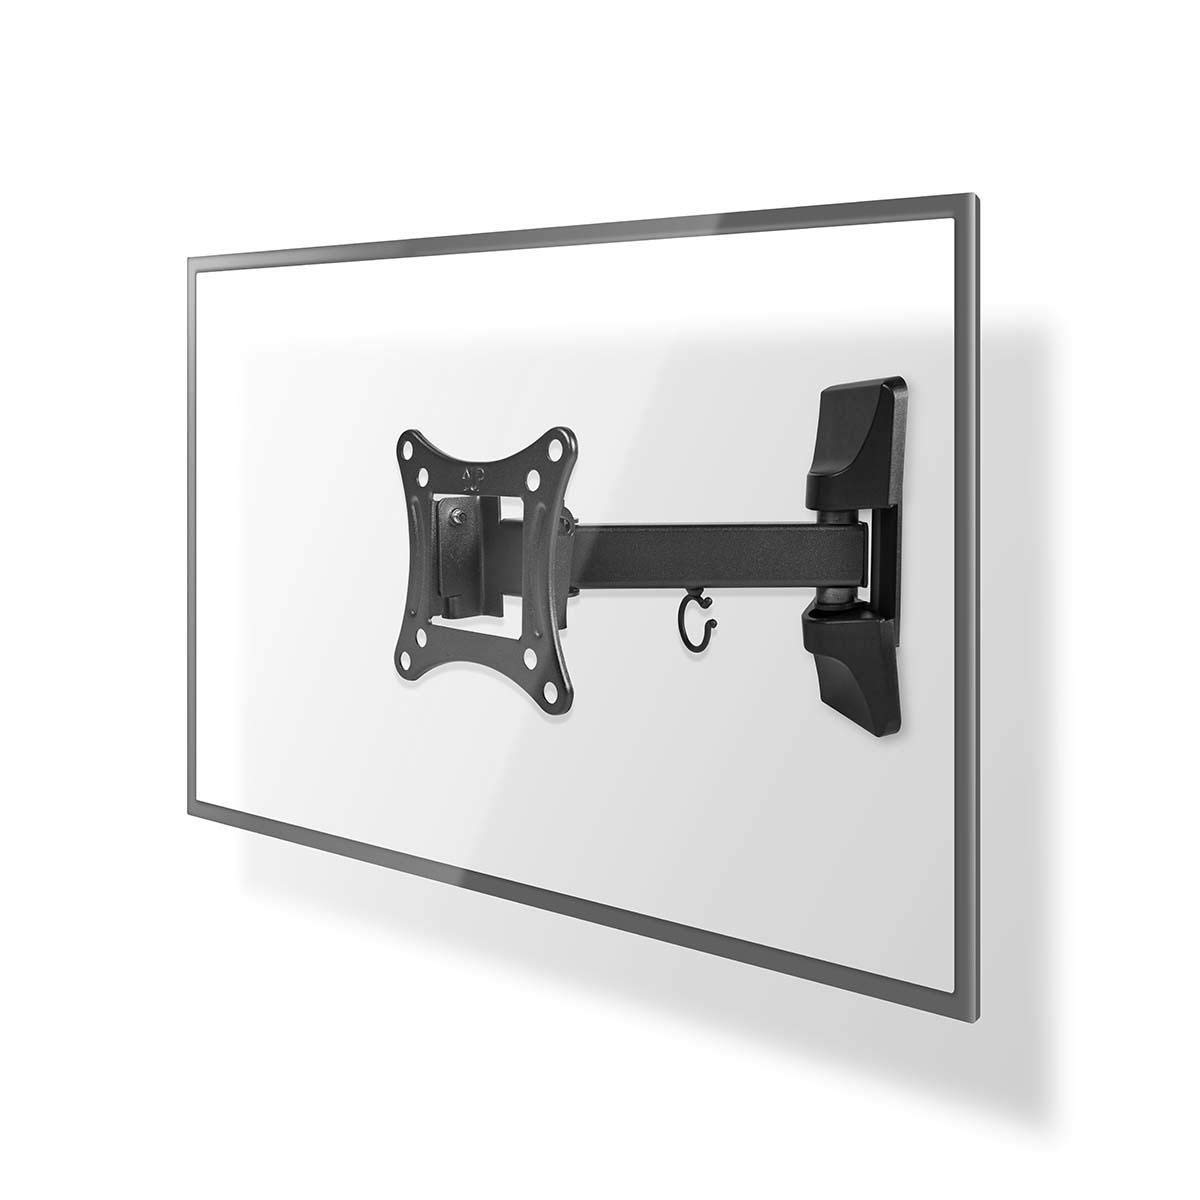 TronicXL - Soporte de pared para televisores Philips 24PFS5603/12 ...